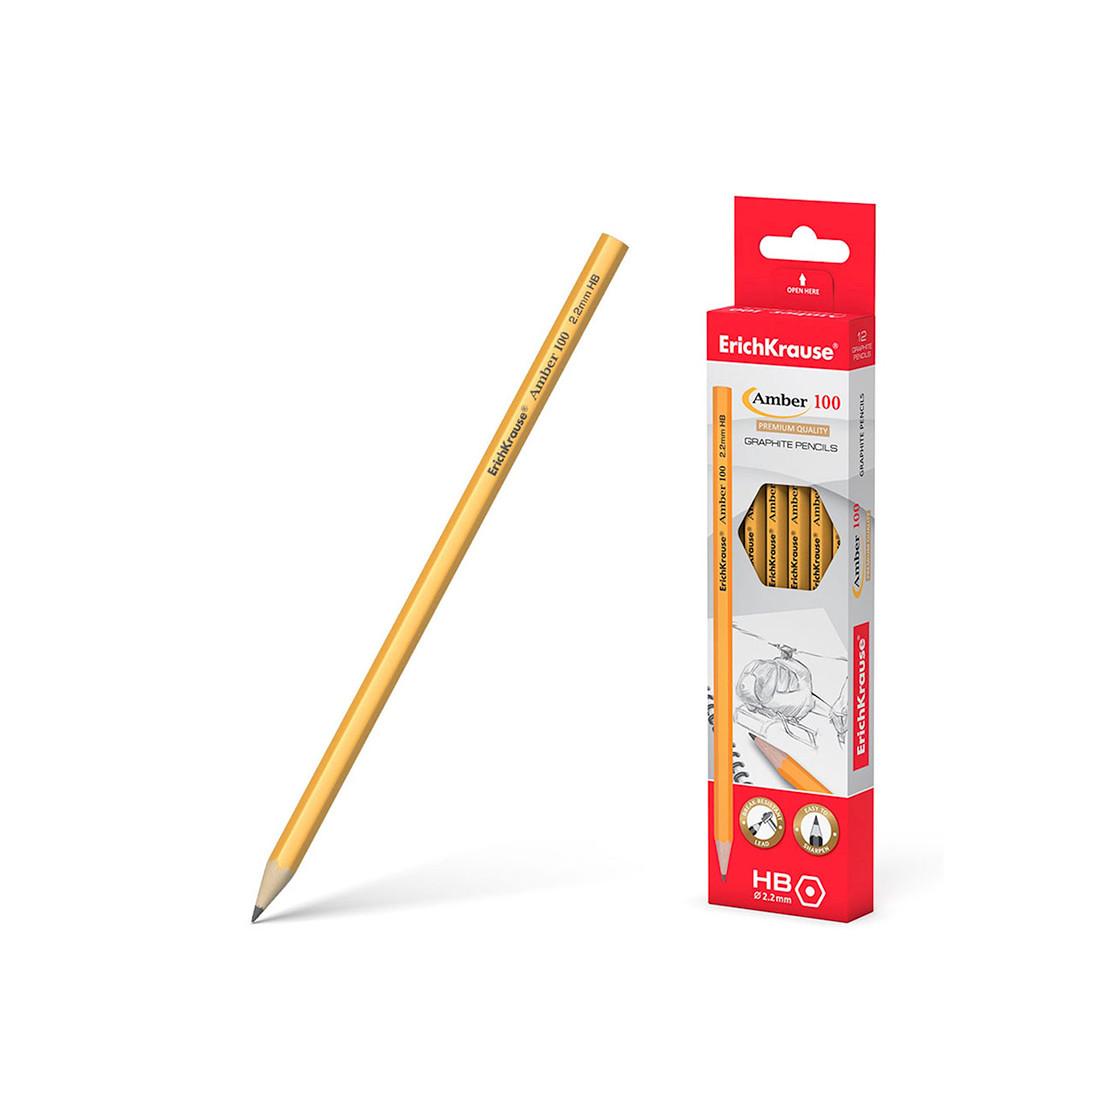 Чернографитный шестигранный карандаш ErichKrause Amber (100 HB)